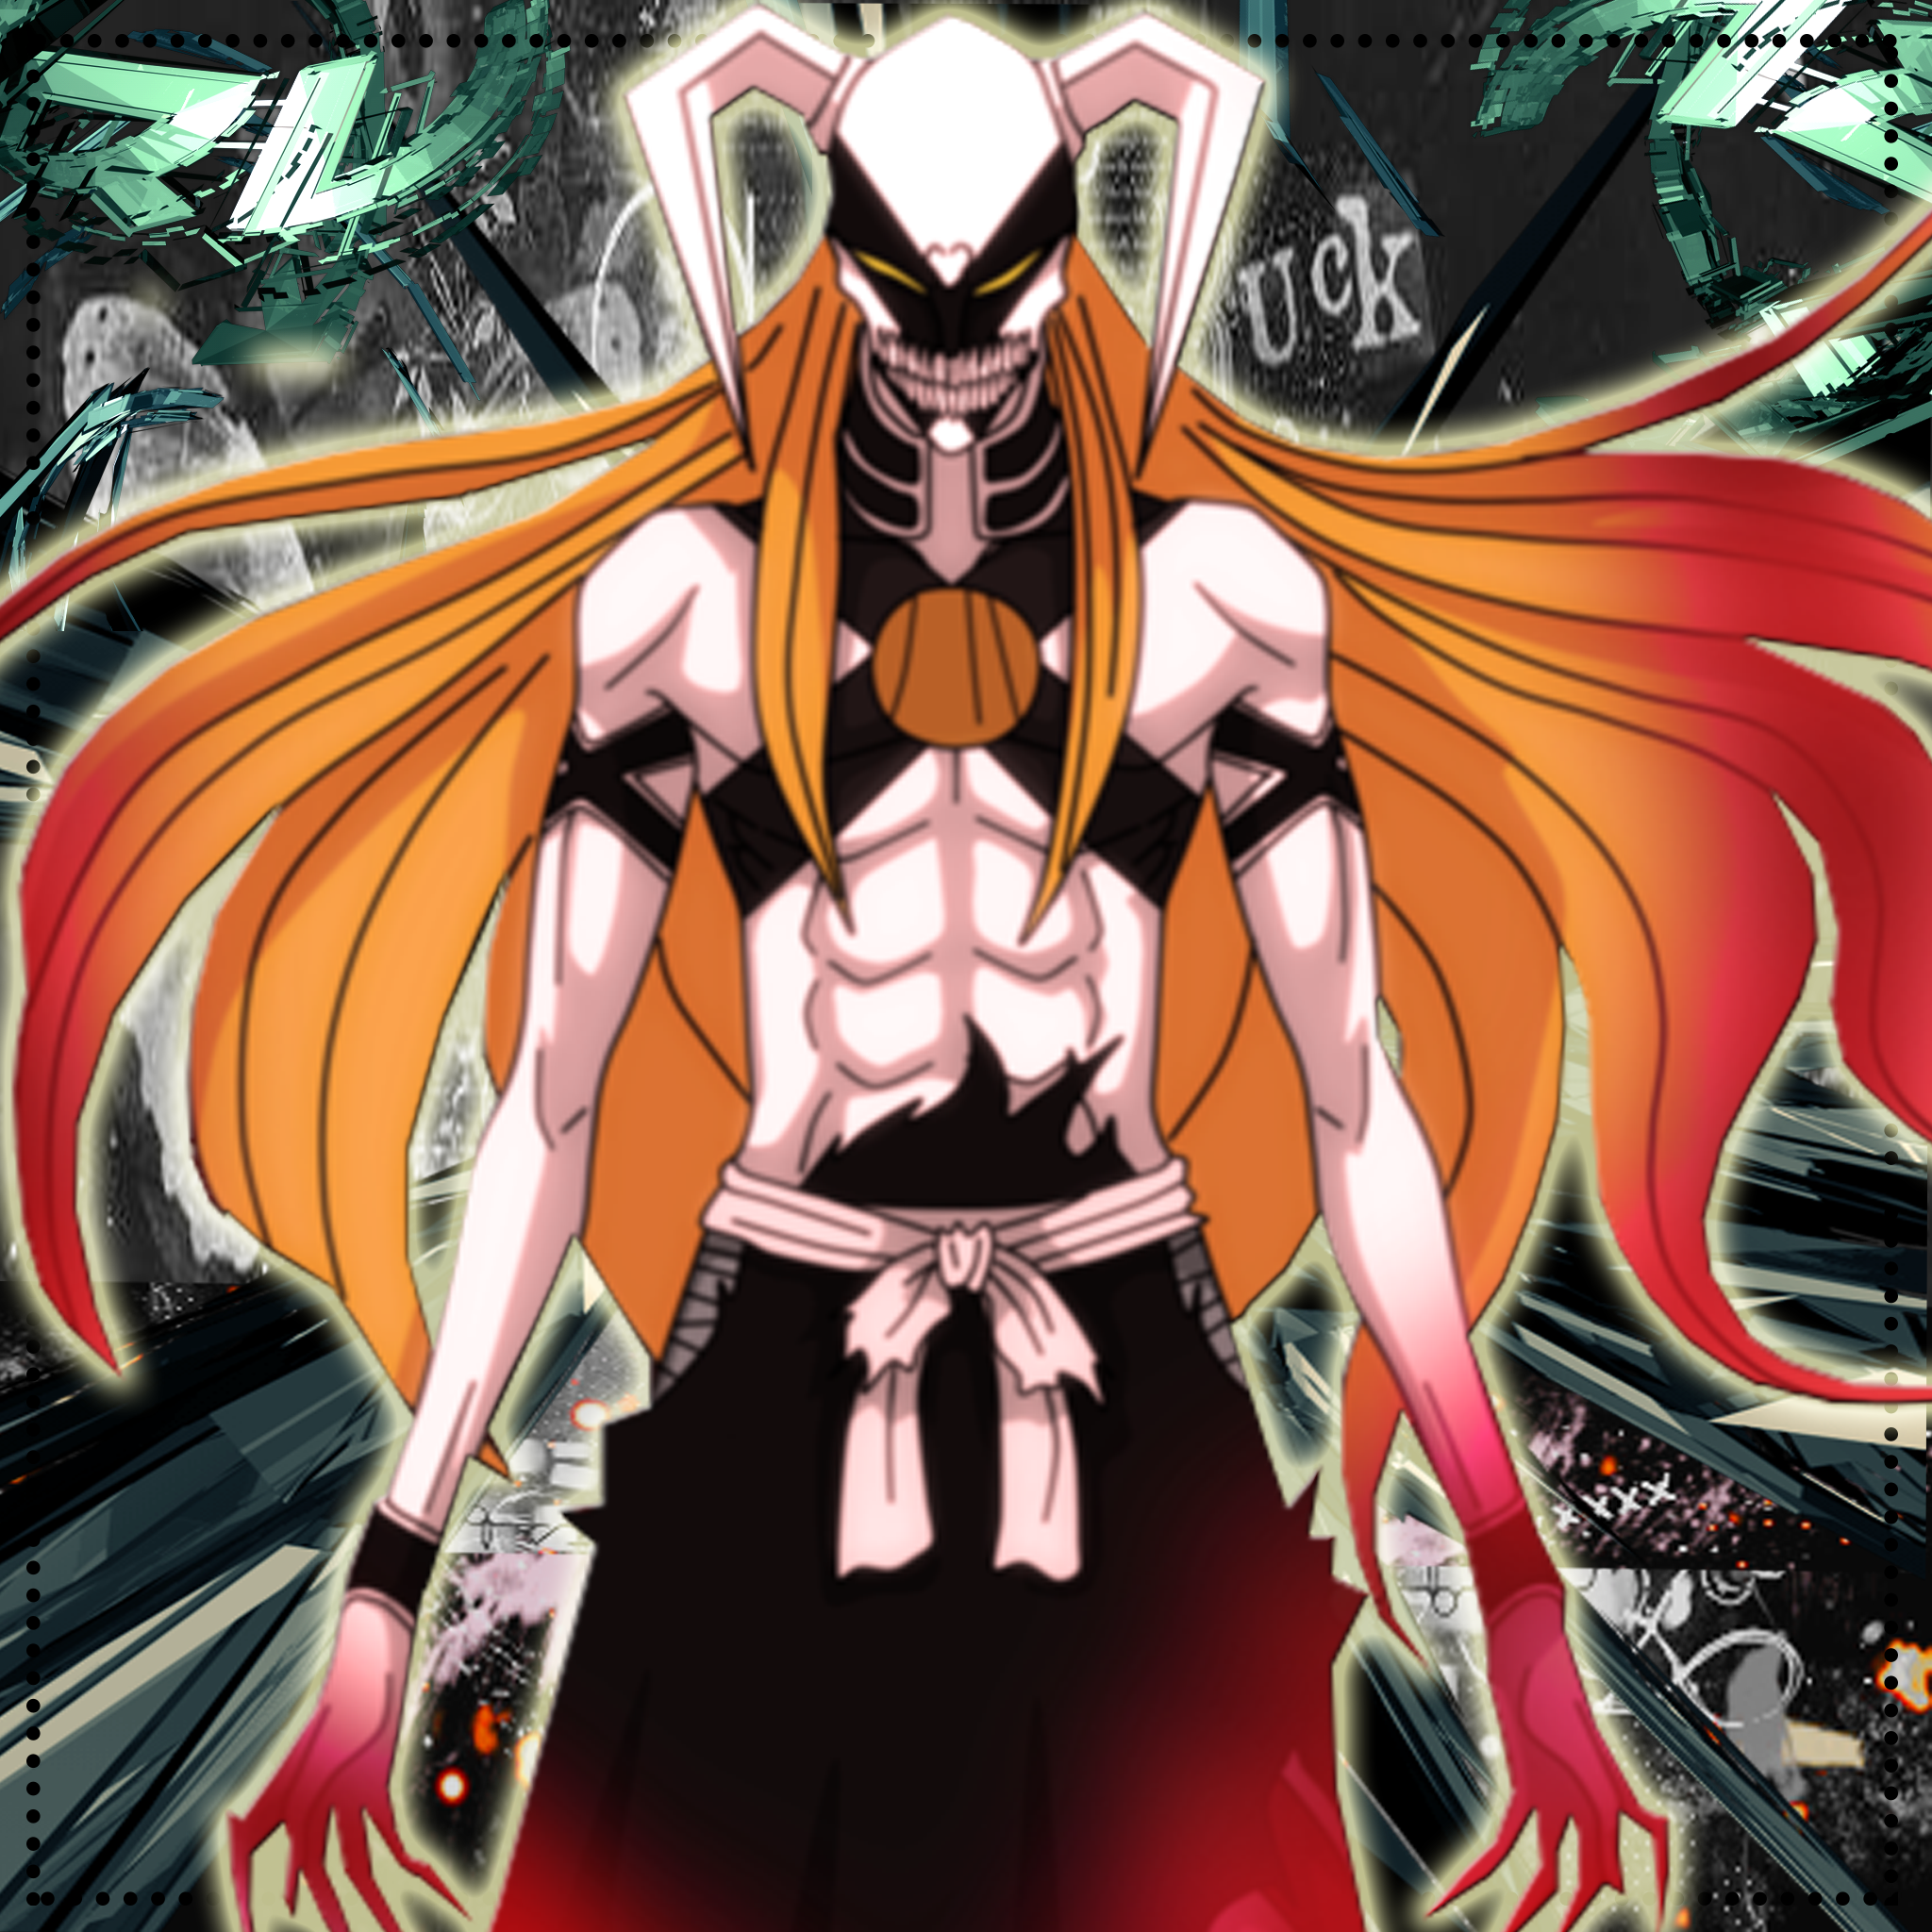 Bleach Ichigo by DarkAnime-OP